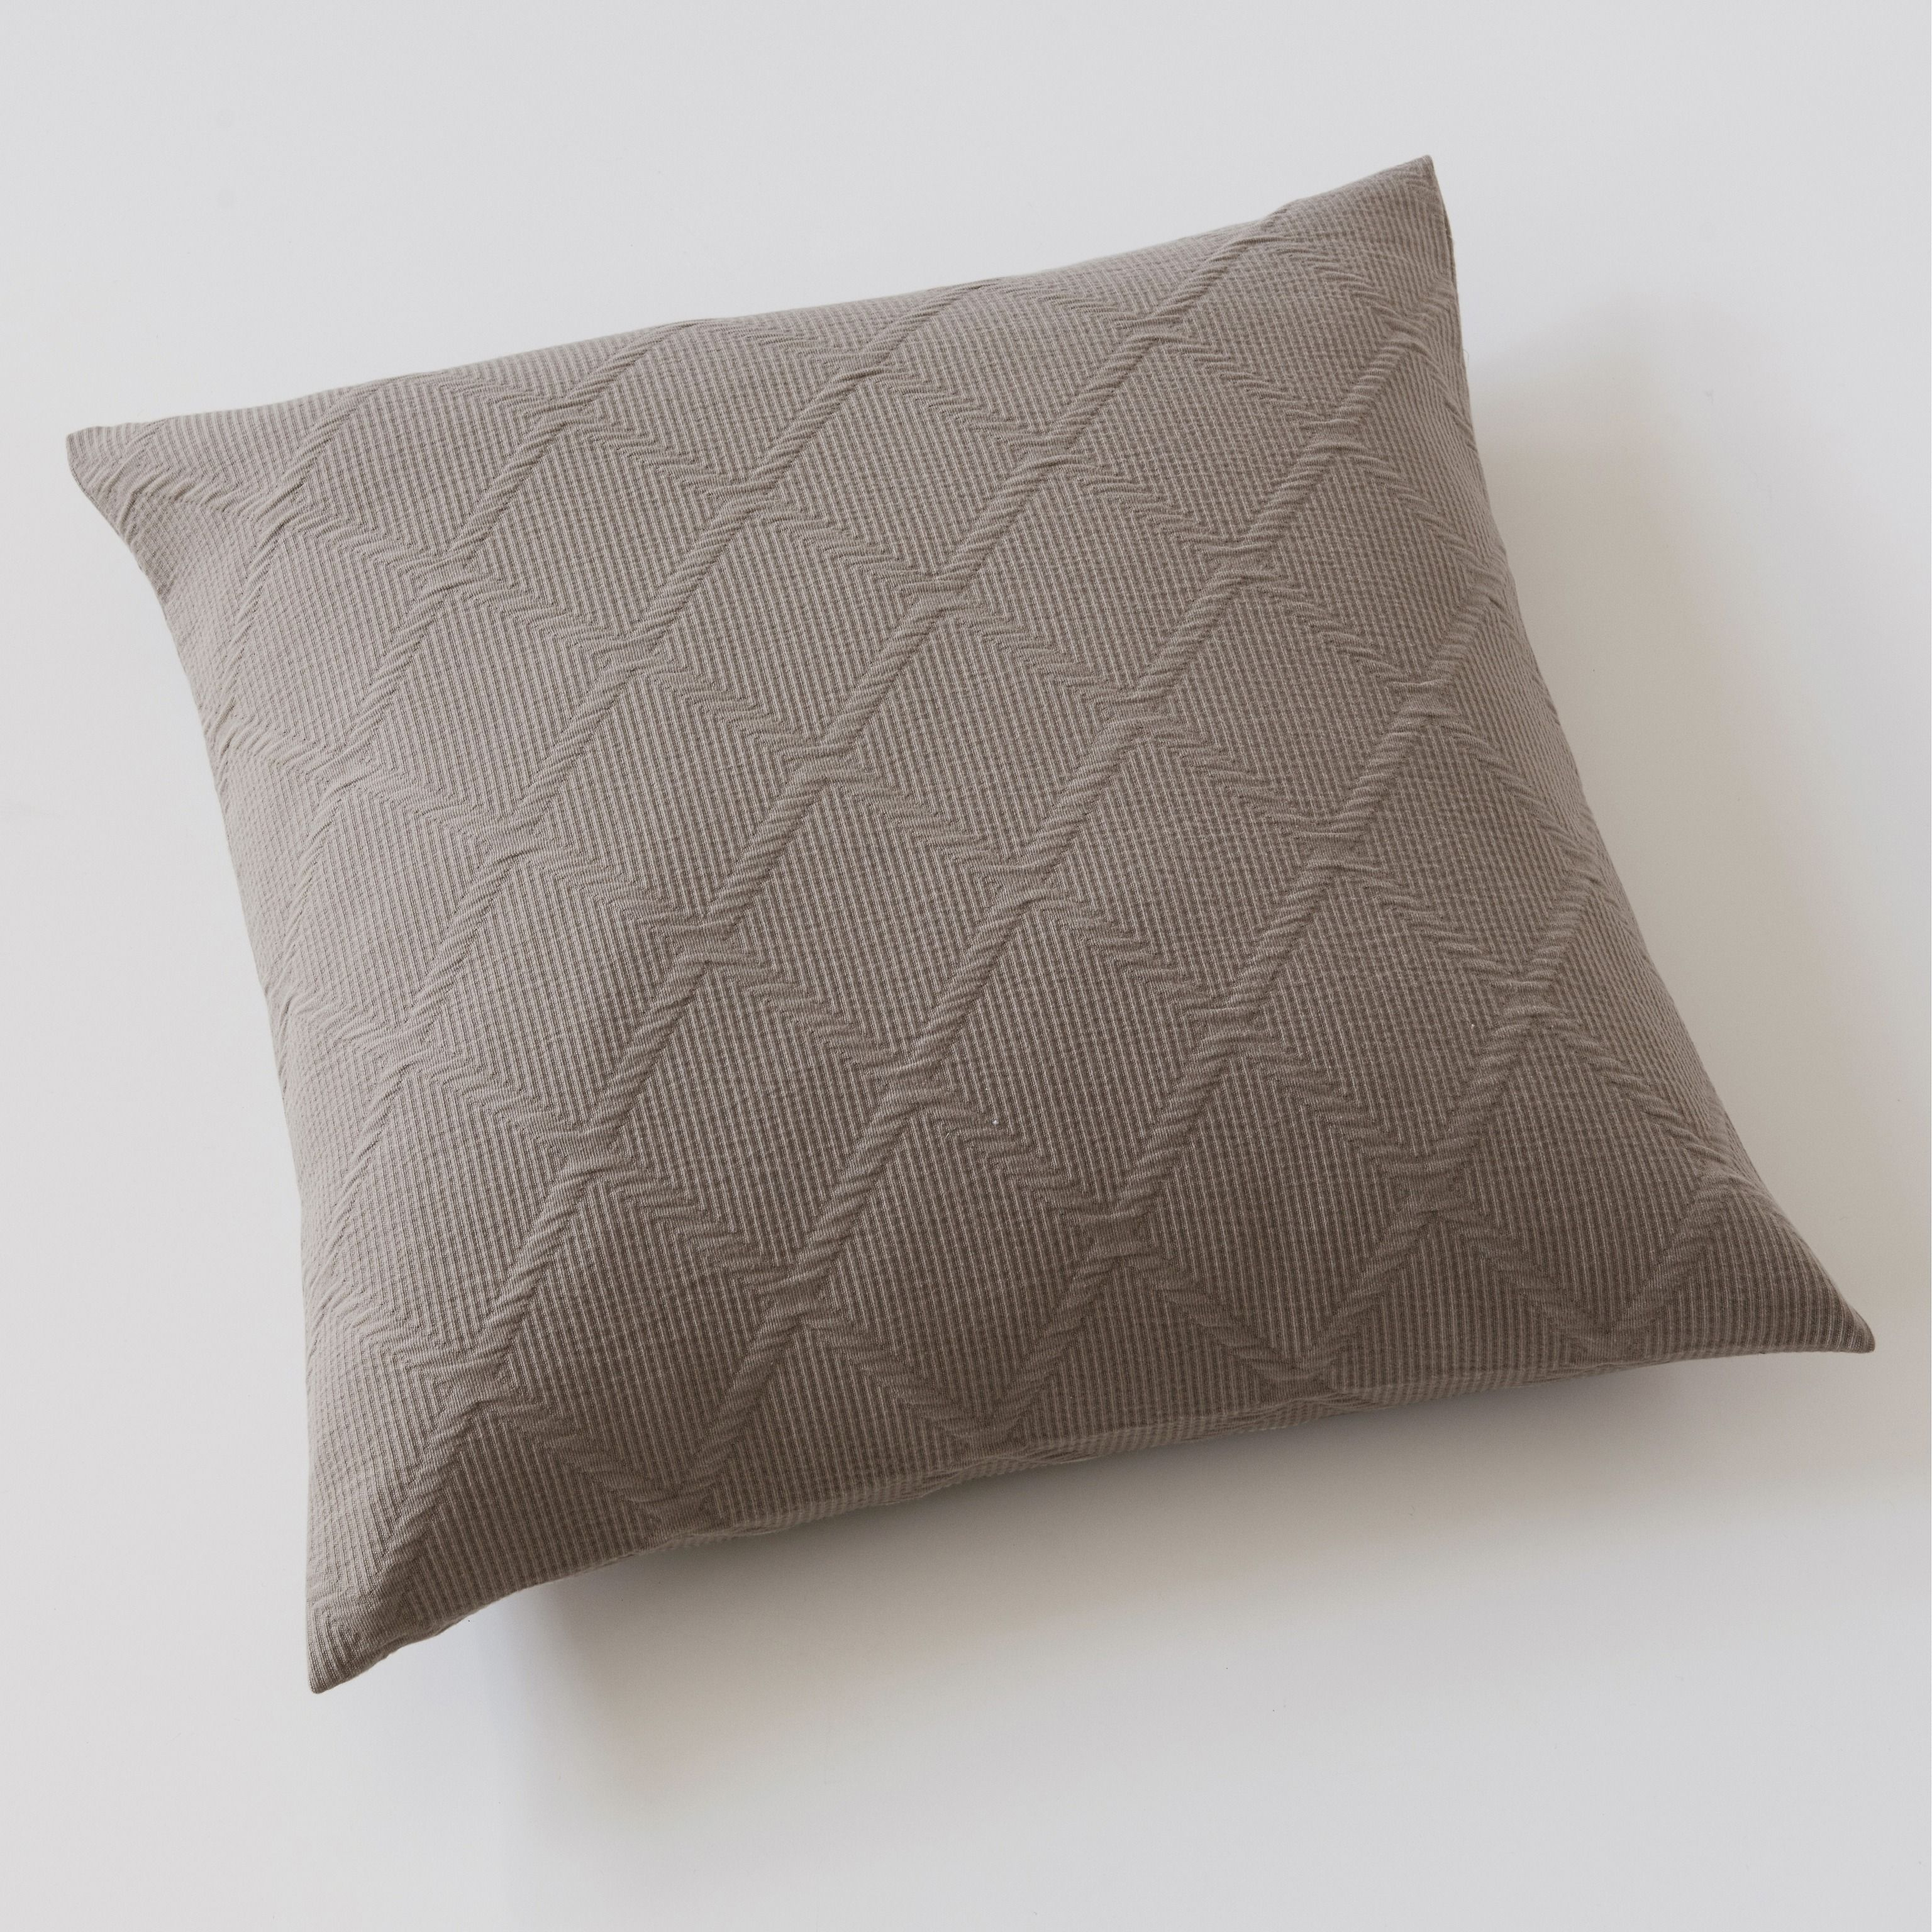 kissenbezug rauten 50 x 50 cm taupe bei. Black Bedroom Furniture Sets. Home Design Ideas